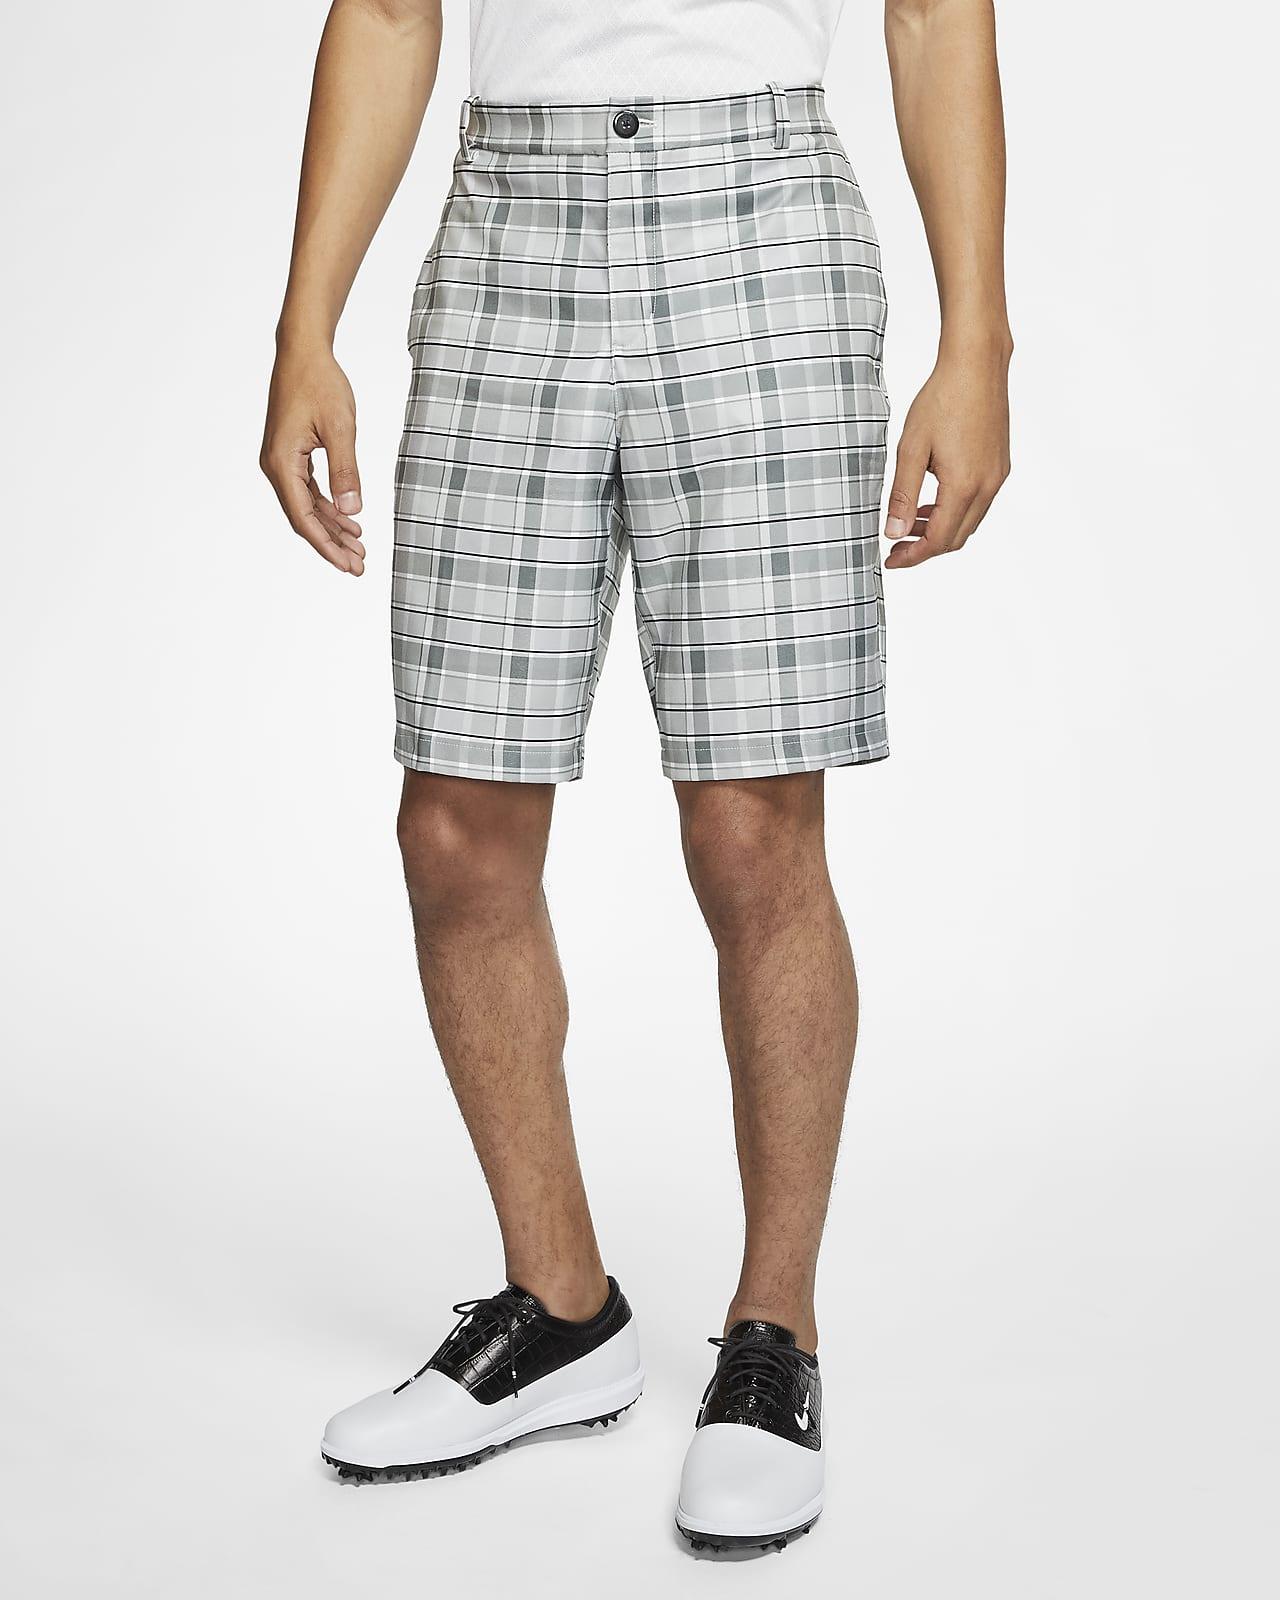 Nike Flex Men's Plaid Golf Shorts